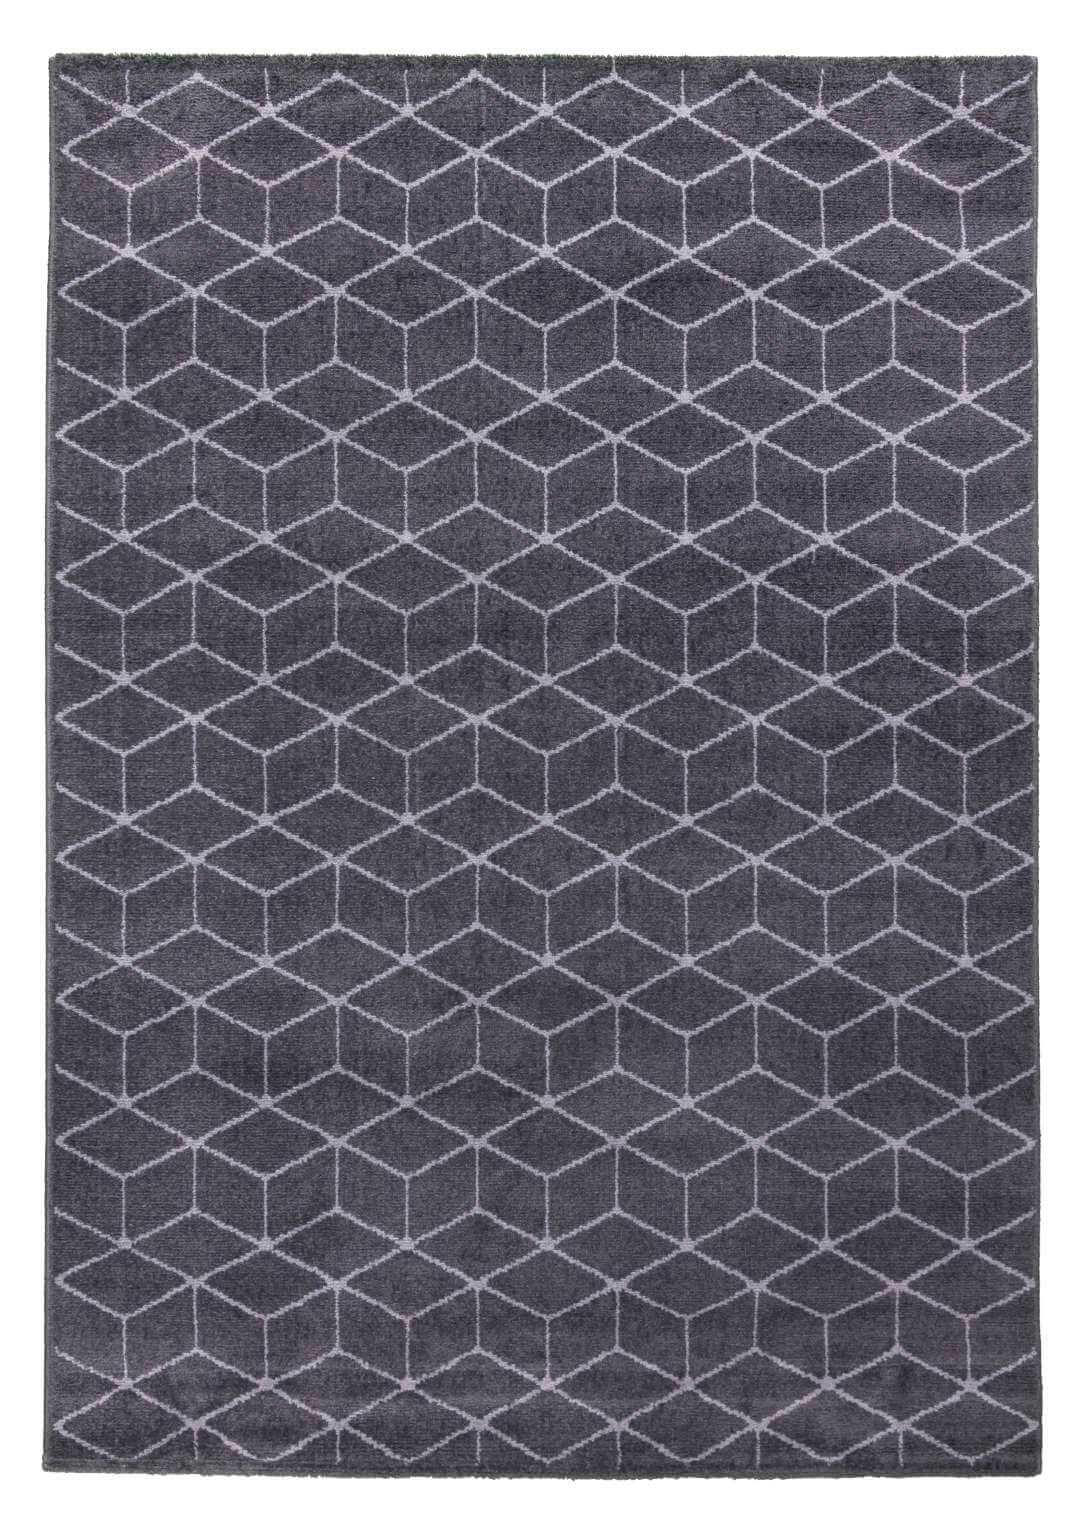 Ambience-Cube-Dark-Grey-Large-2